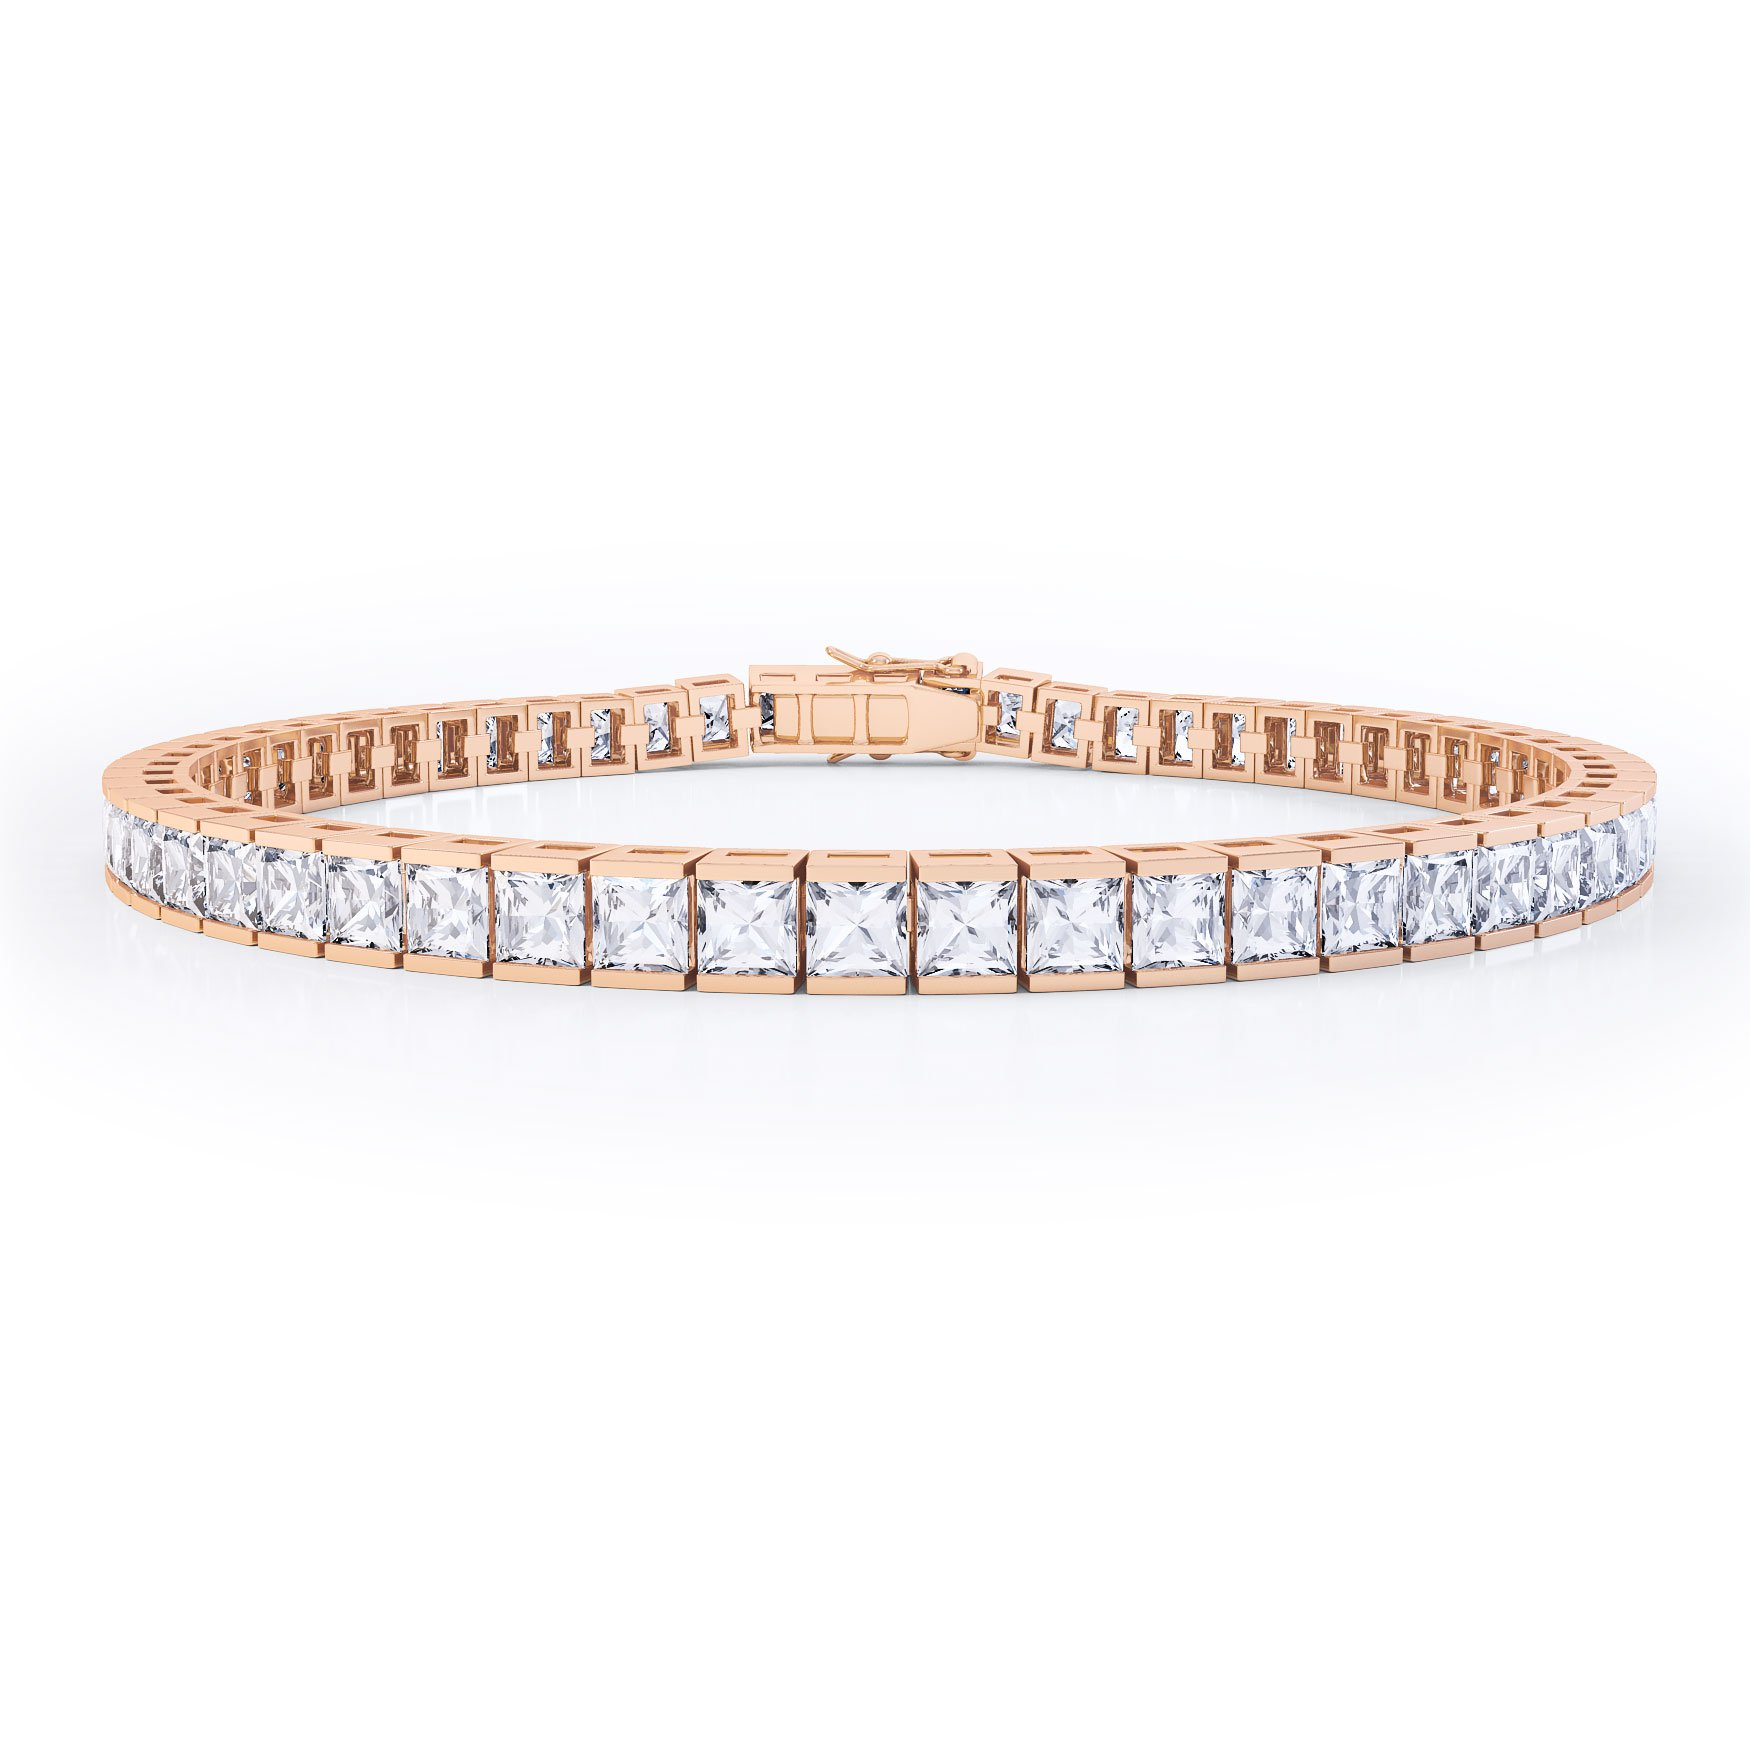 Princess White Sapphire 18ct Rose Gold Tennis Bracelet